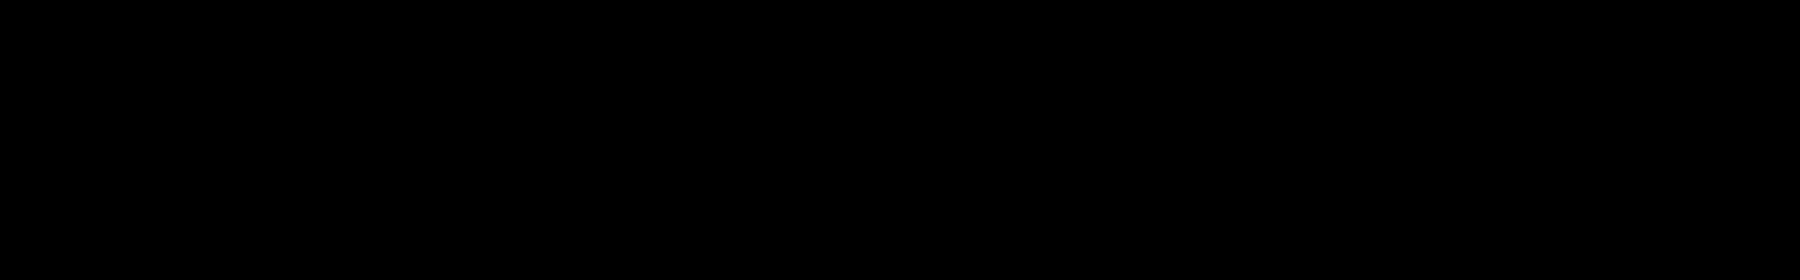 Psytrance Impact audio waveform